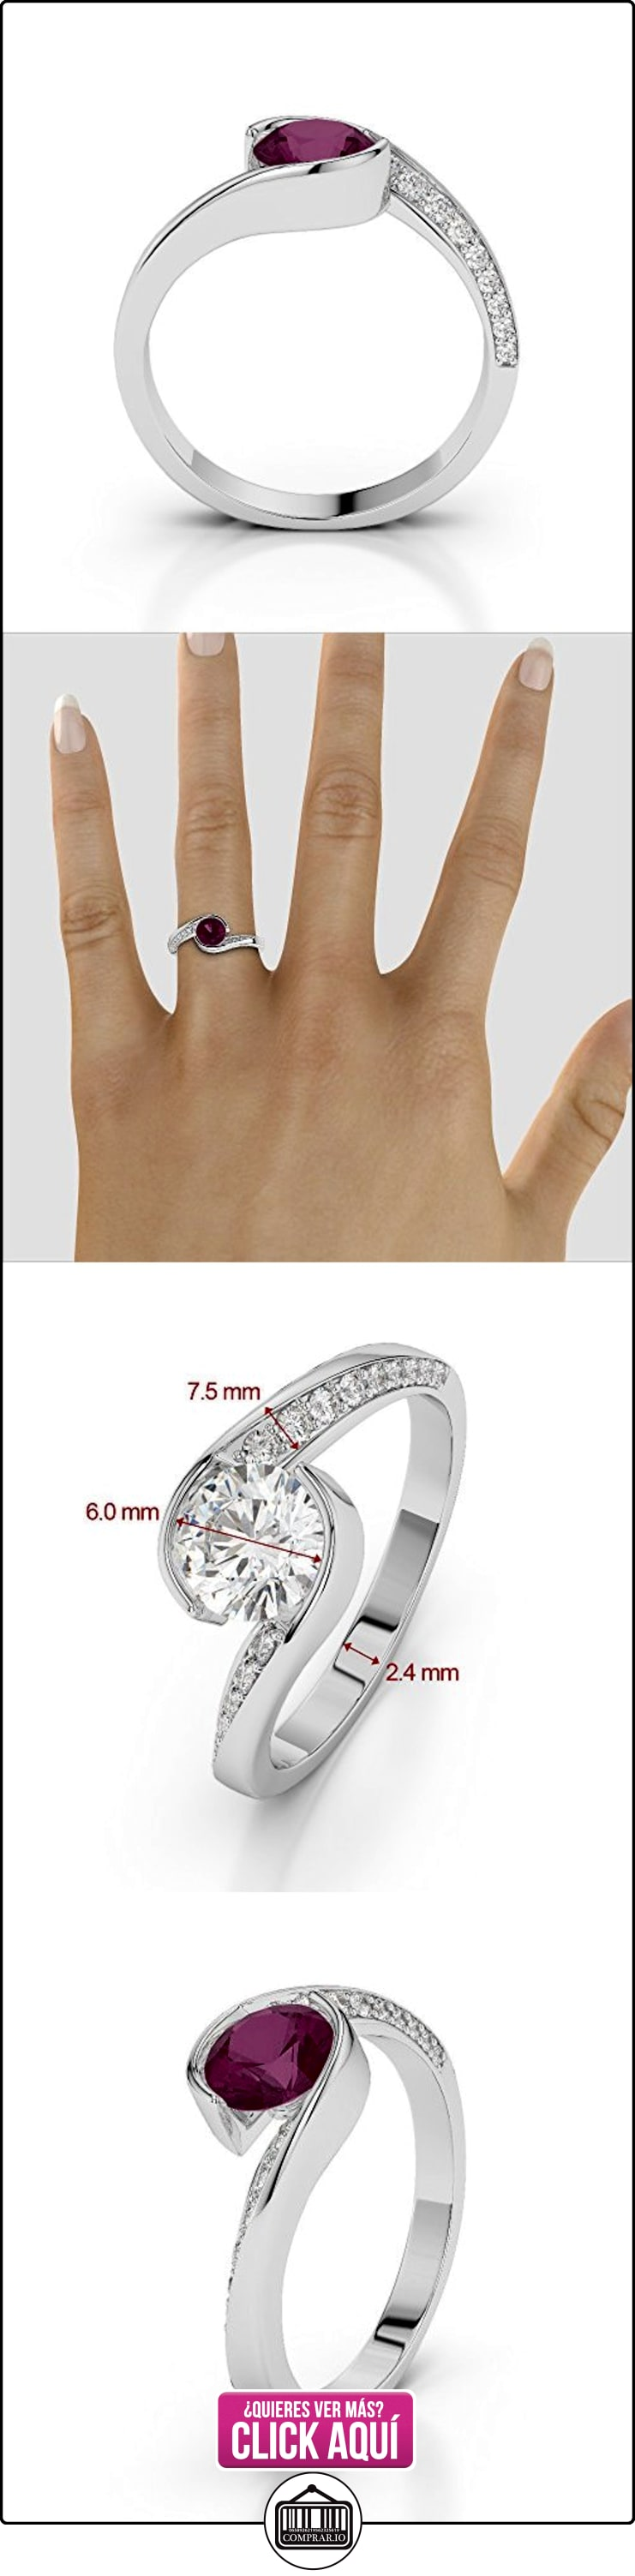 AG & Sons Hombre  950 Platino  platino redondo Round Brilliant   rojo GH diamante rubí FINERING  ✿ Joyas para hombres especiales - lujo ✿ ▬► Ver oferta: https://comprar.io/goto/B01HTH2E96